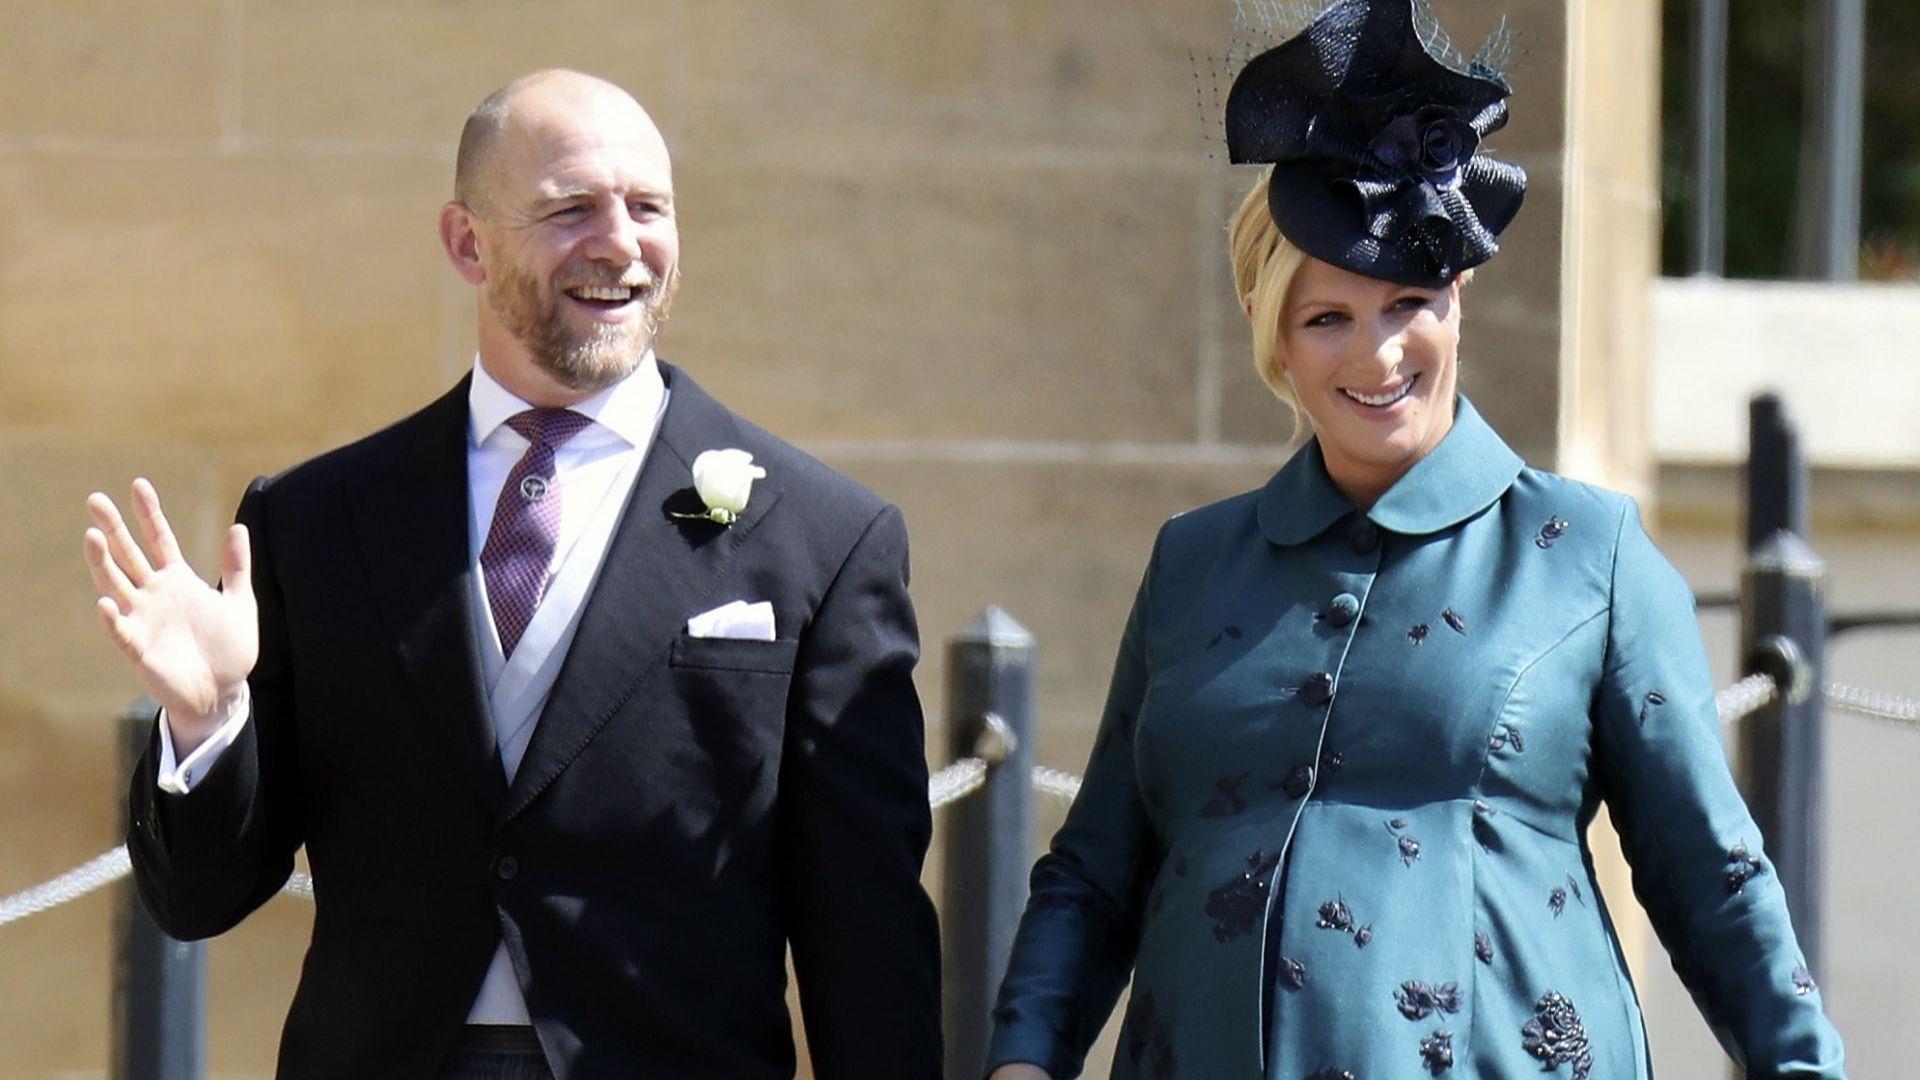 Десетият правнук на кралица Елизабет Втора се роди вкъщи